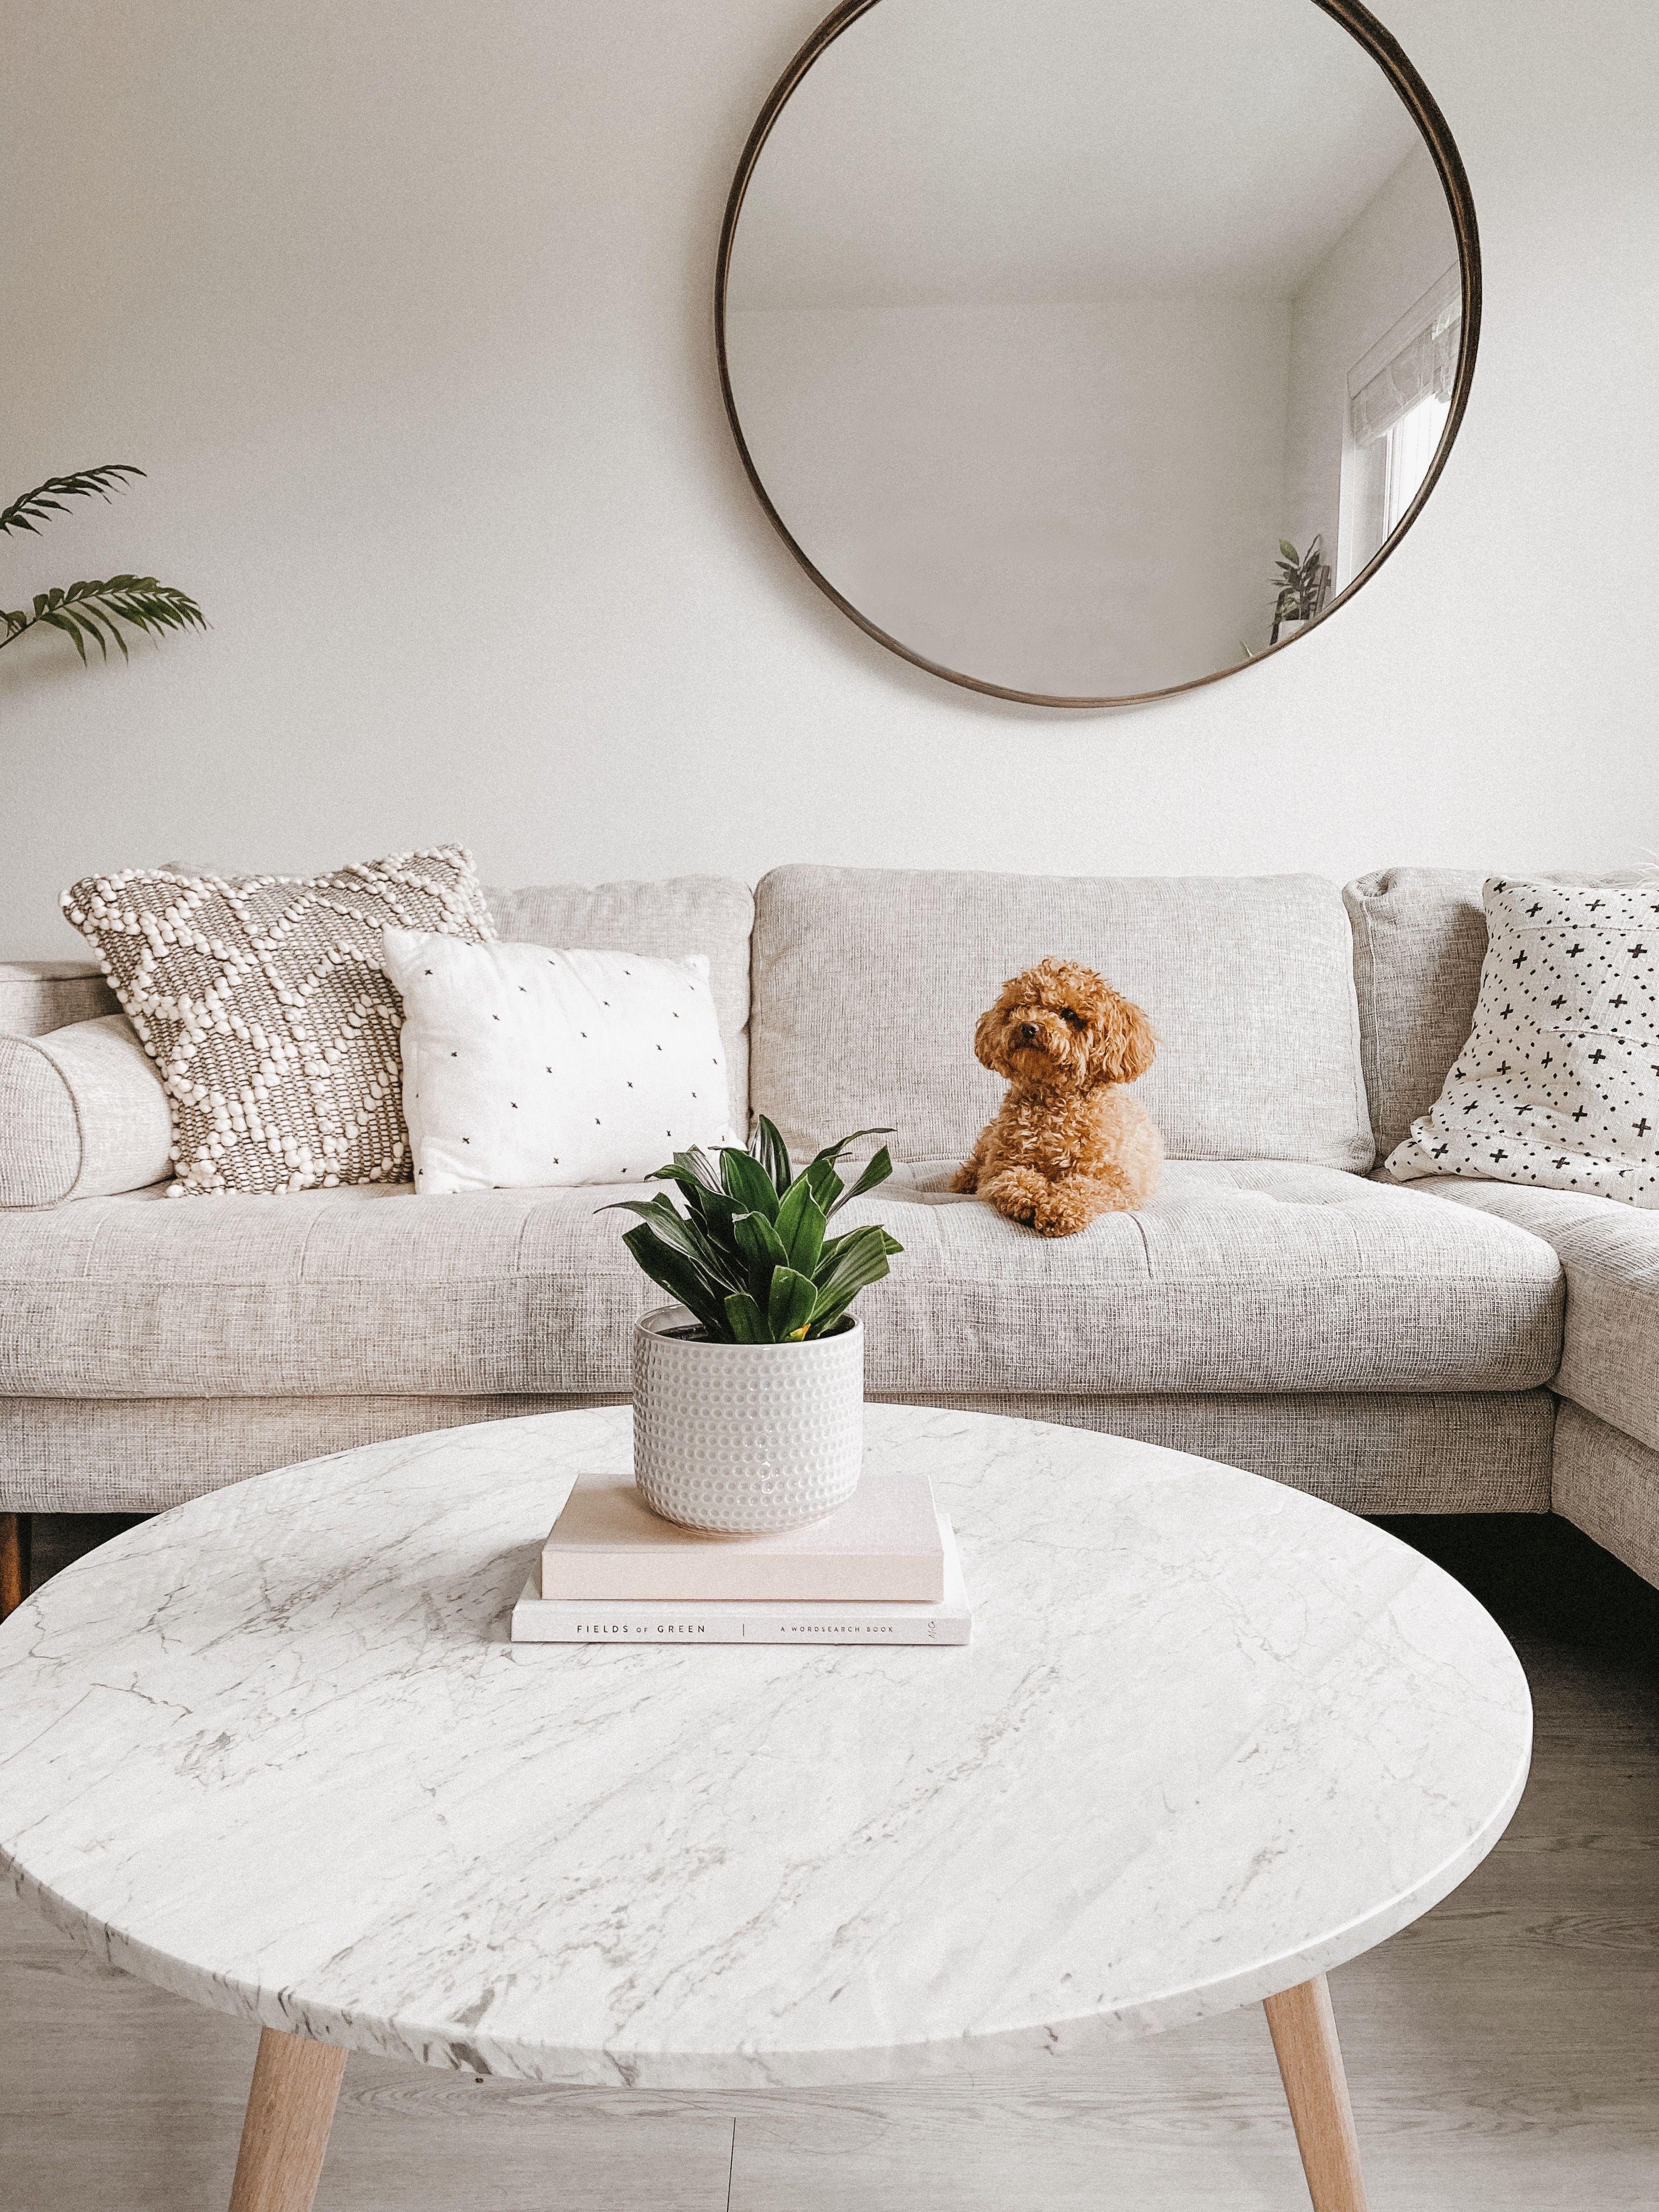 Pin On Home Interior Design Minimalist Neutral Boho